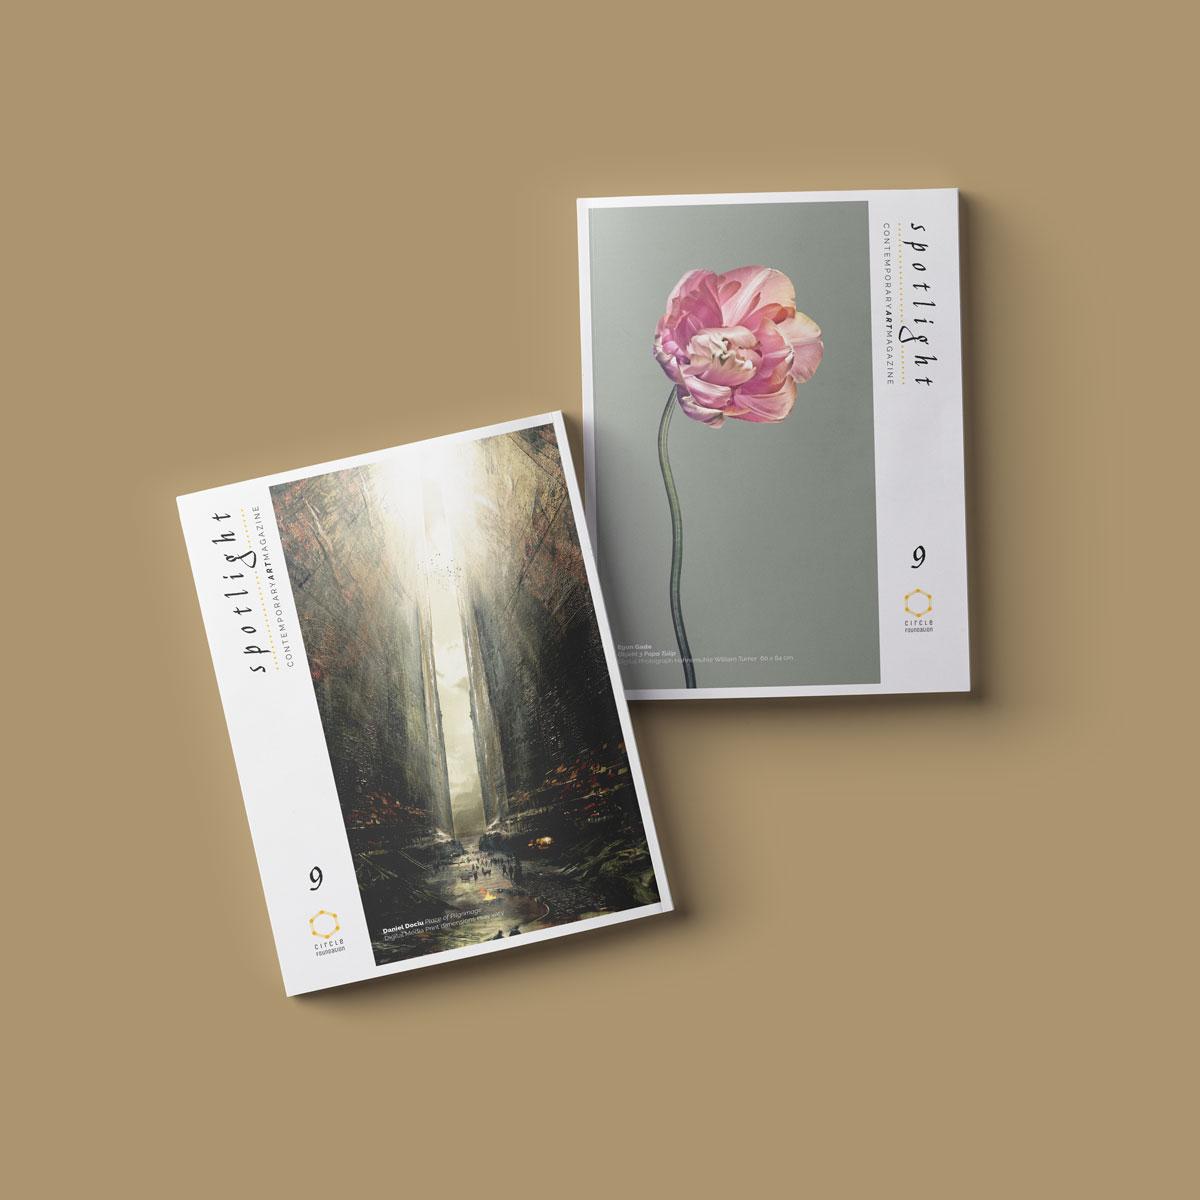 Spotlight Magazine - Issue 9